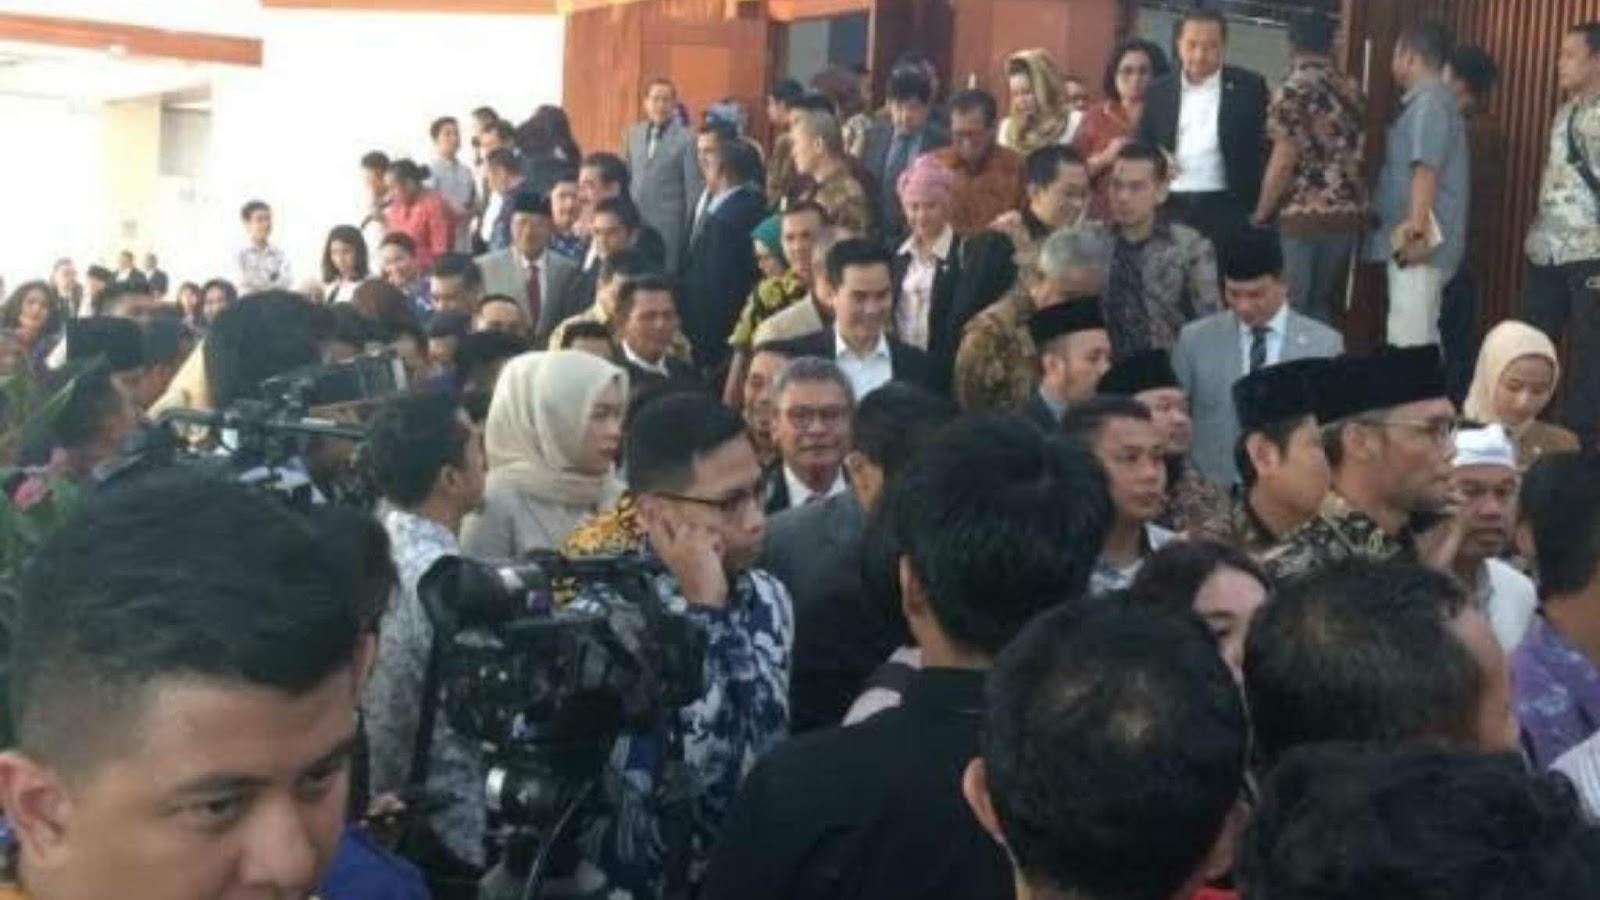 2.000 Anggota DPR dan Keluarga Dites Corona Duluan, Rakyat Belakangan?